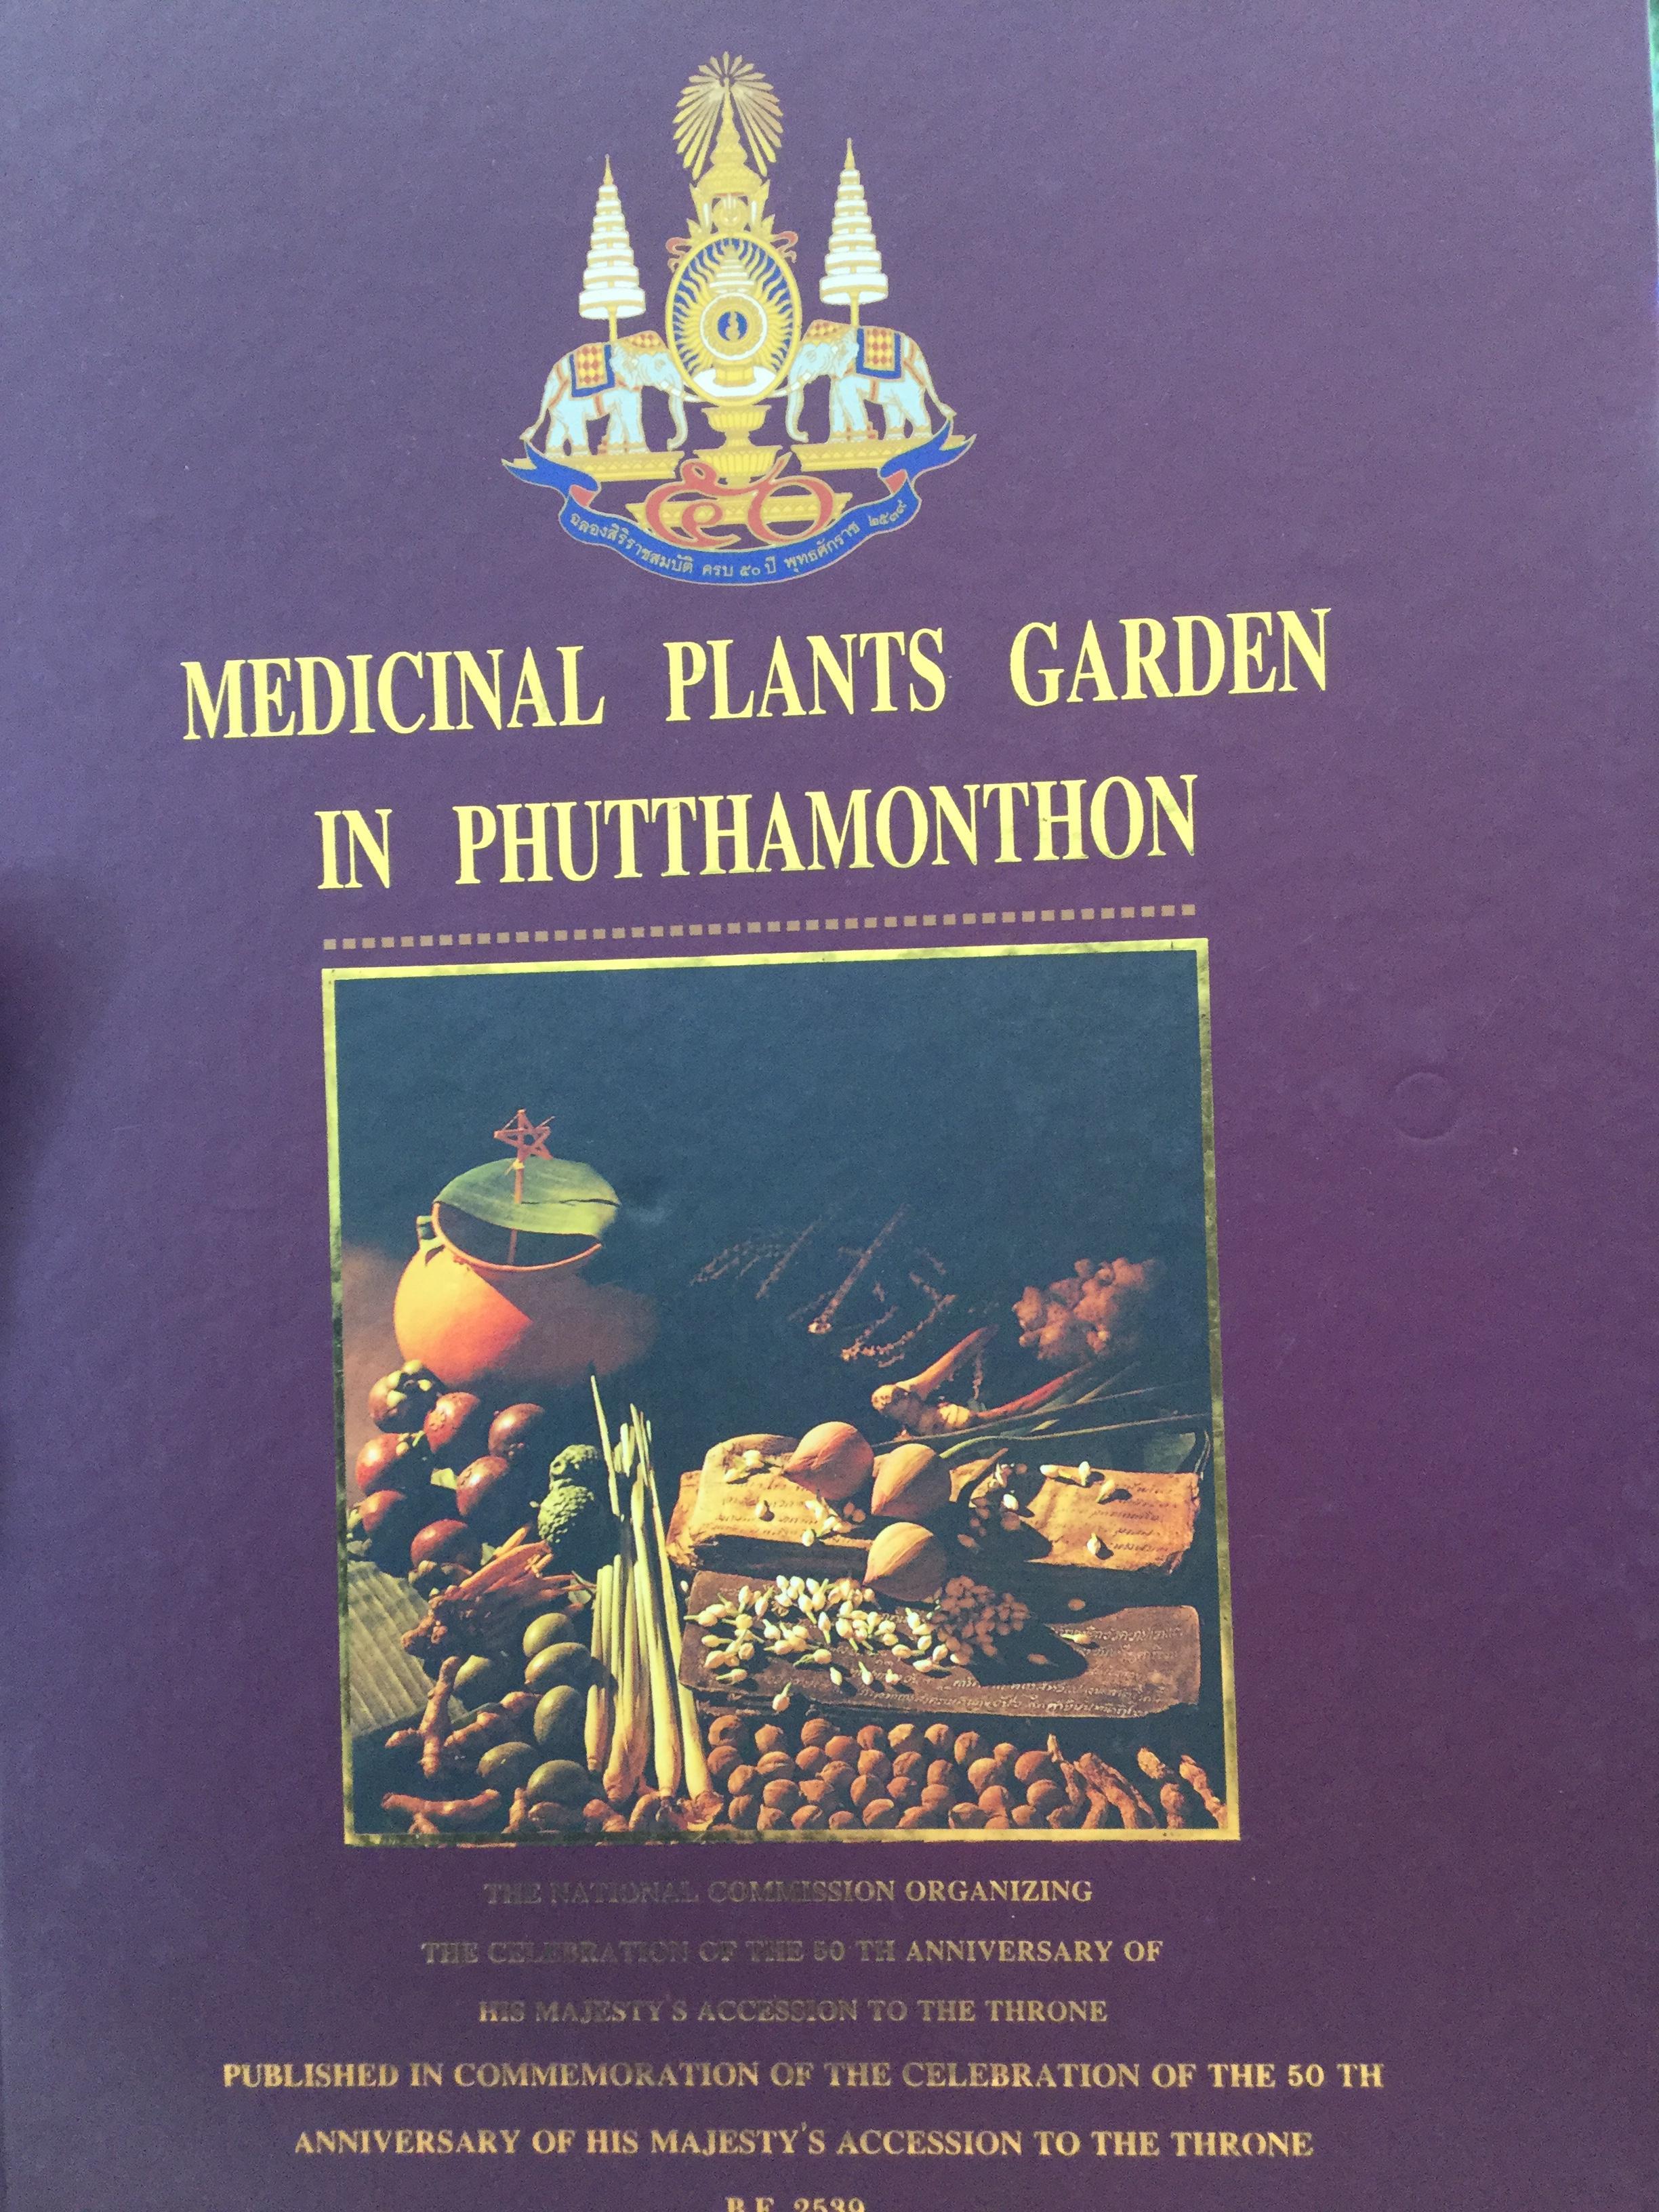 MEDICINAL PLANTS GARDEN IN PHUTTHAMONTHON. รวมรวมต้นไม้ดอก-ไม้ประดับในพุทธมณฑล จัดพิมพ์เนื่องในวโรกาสที่พระบาทสมเด็จพระเจ้าอยู่หัว ภูมิพลอดุลยเดช ครองราชย์ครบ 50 ปี